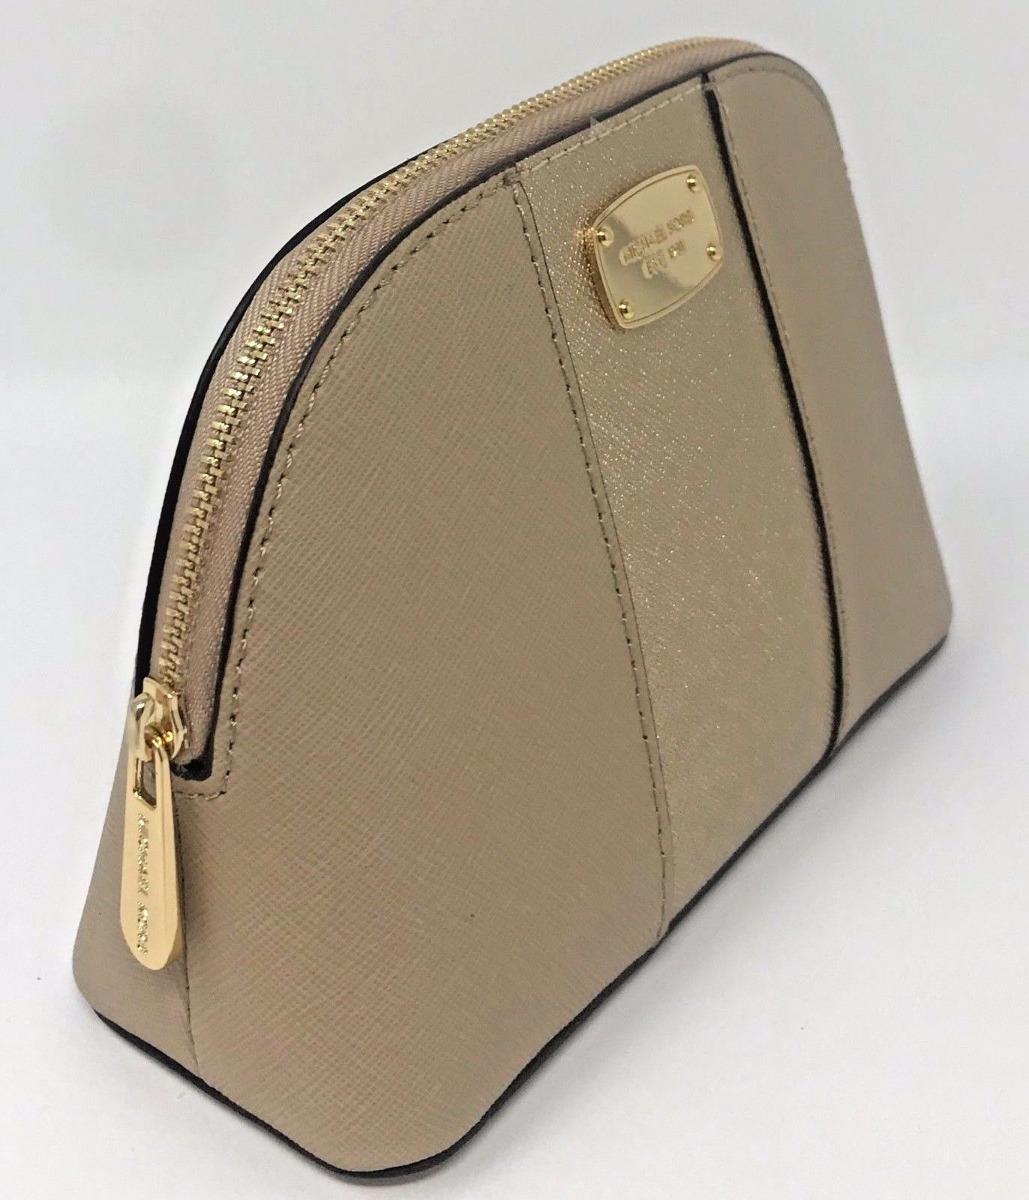 9b8521f09 cartera billetera michael kors nueva original - brandlet. Cargando zoom.